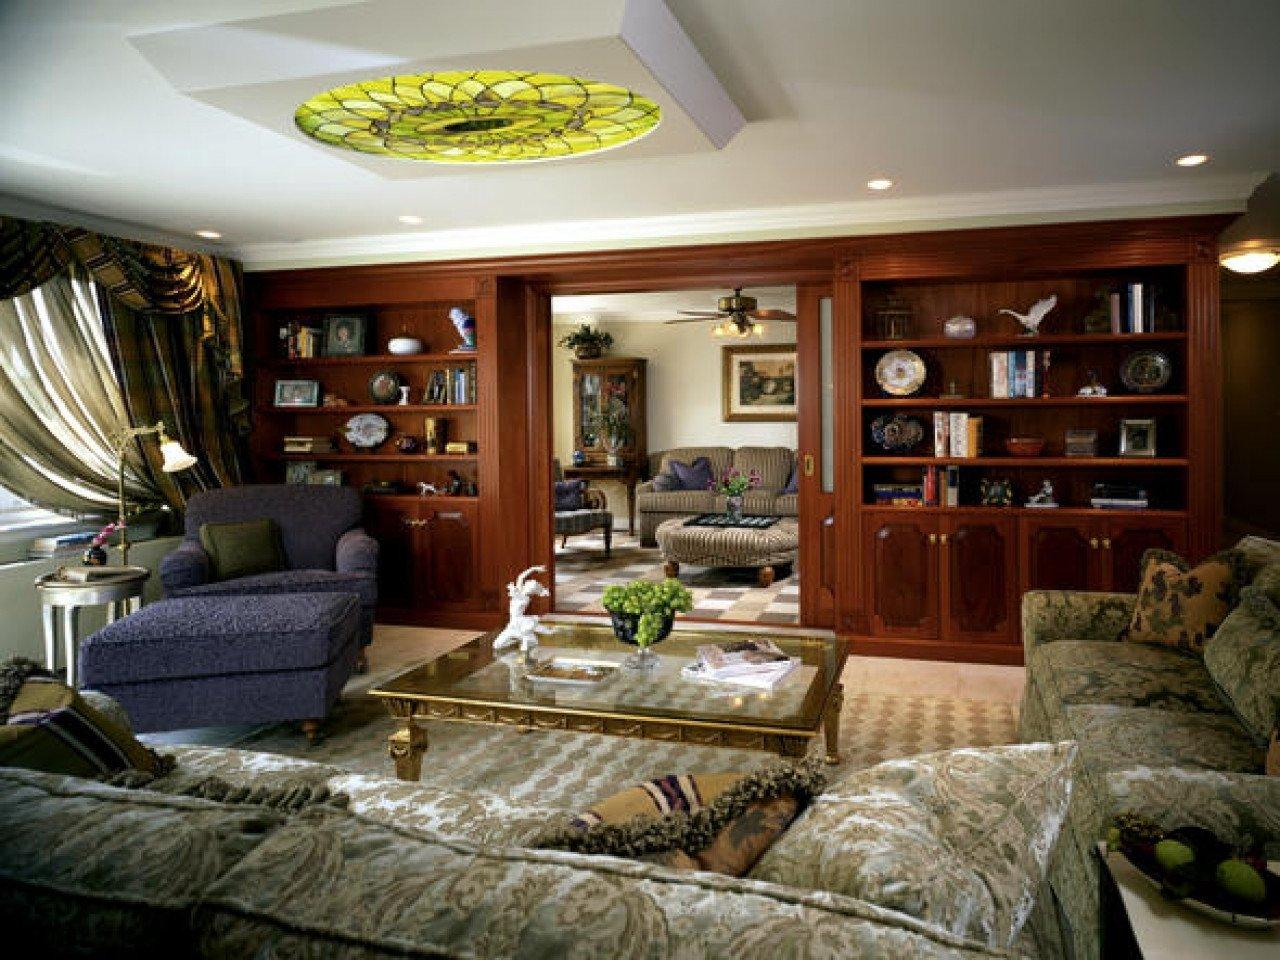 Traditional Living Room Color Patio sofas Choosing Paint Color Living Room Traditional